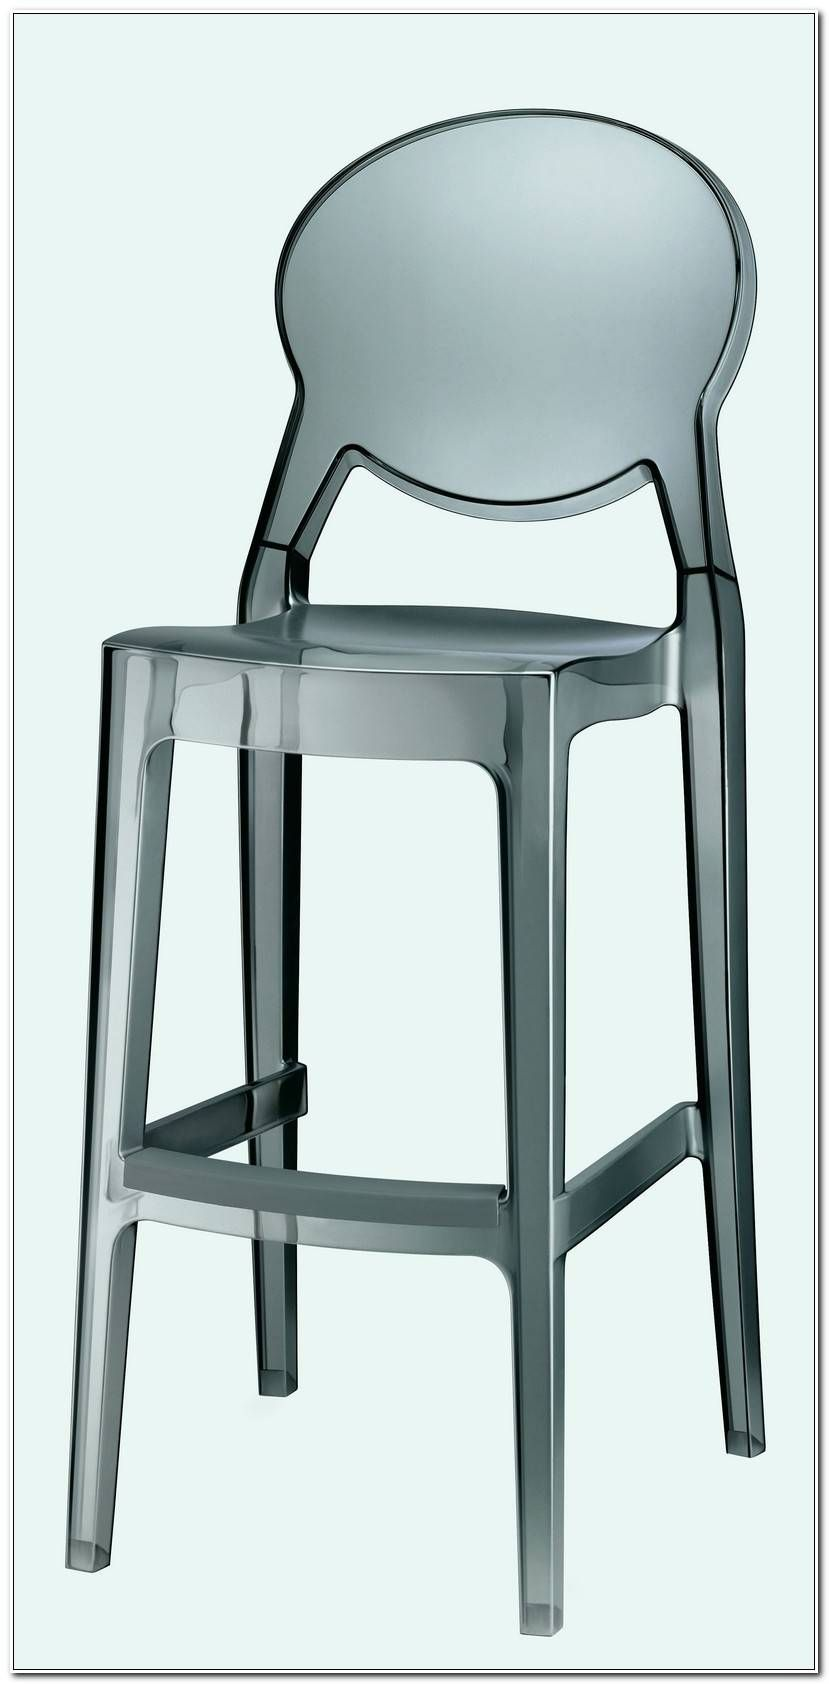 Elegant Chaise De Bar Transparente In 2020 Decor Modern Interior Design Ghost Chair